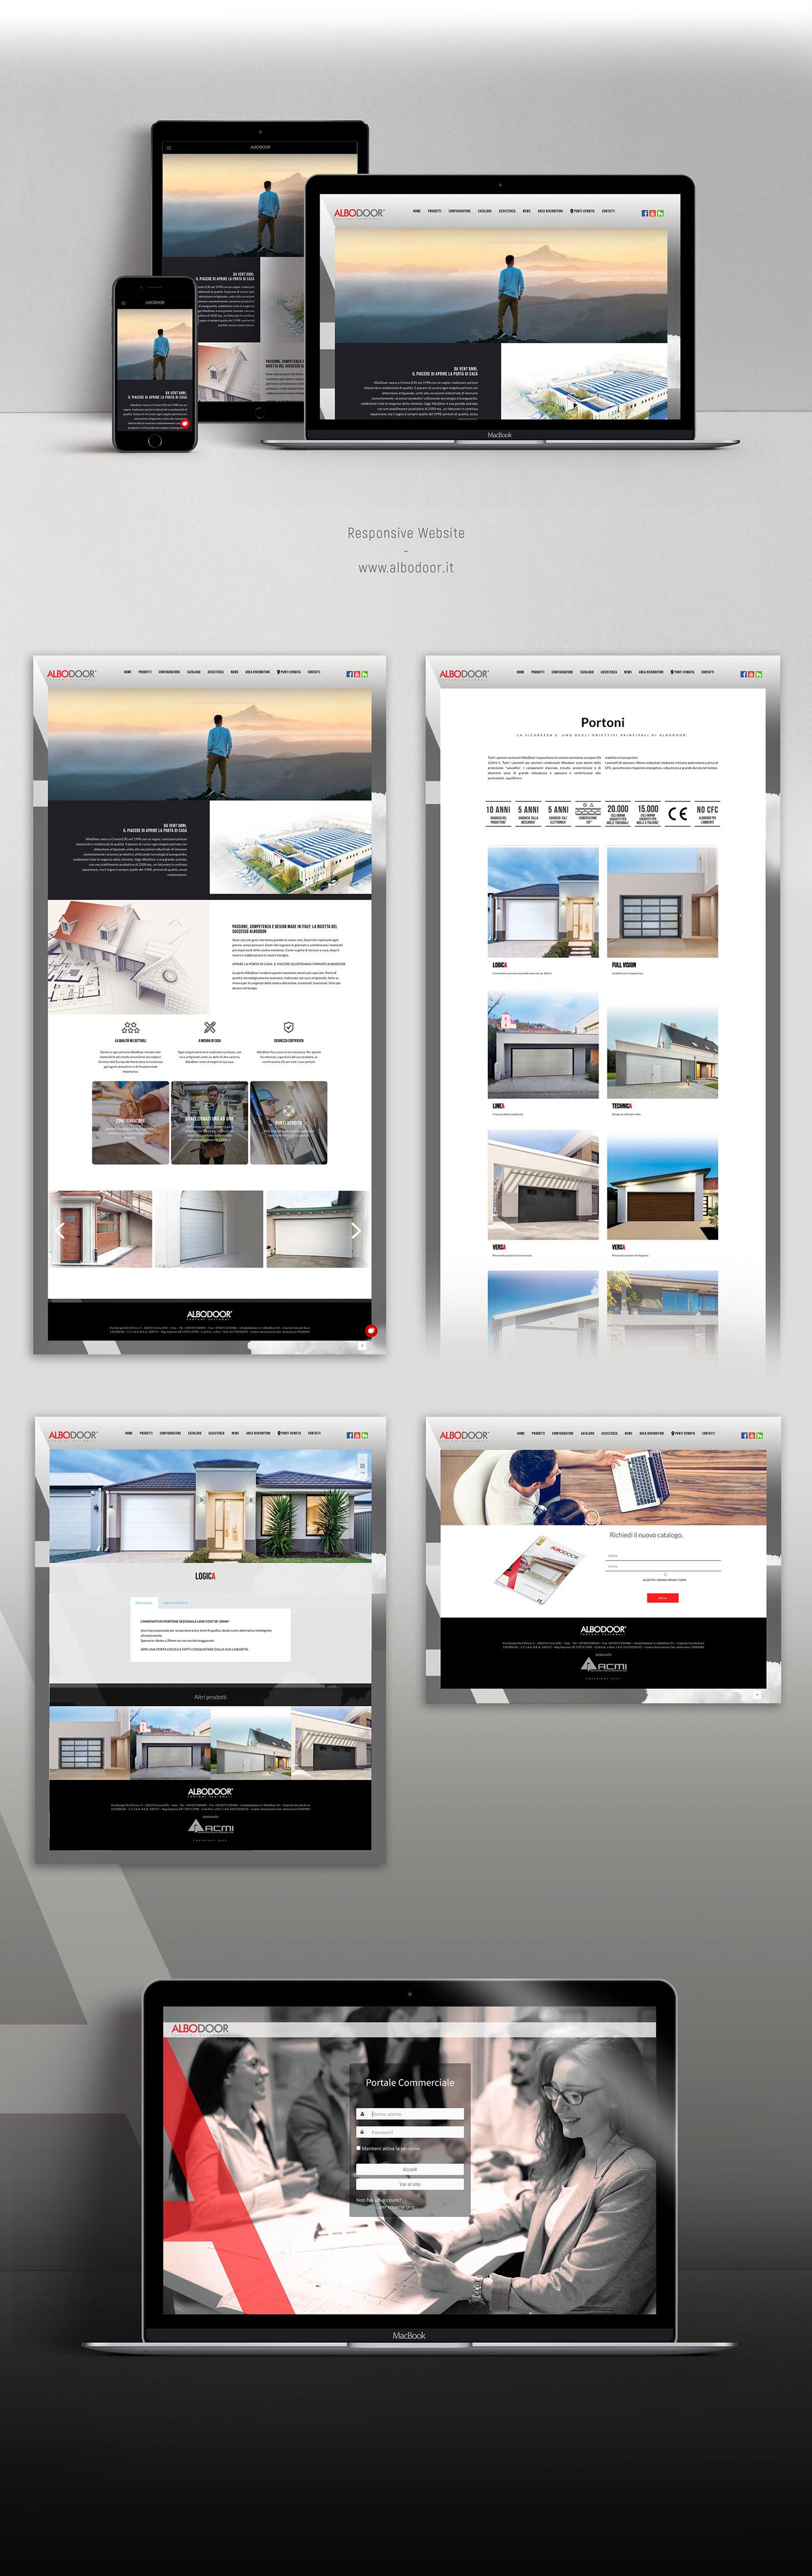 design iPad iphone Italy macbook Responsive retina Web Webdesign wesite